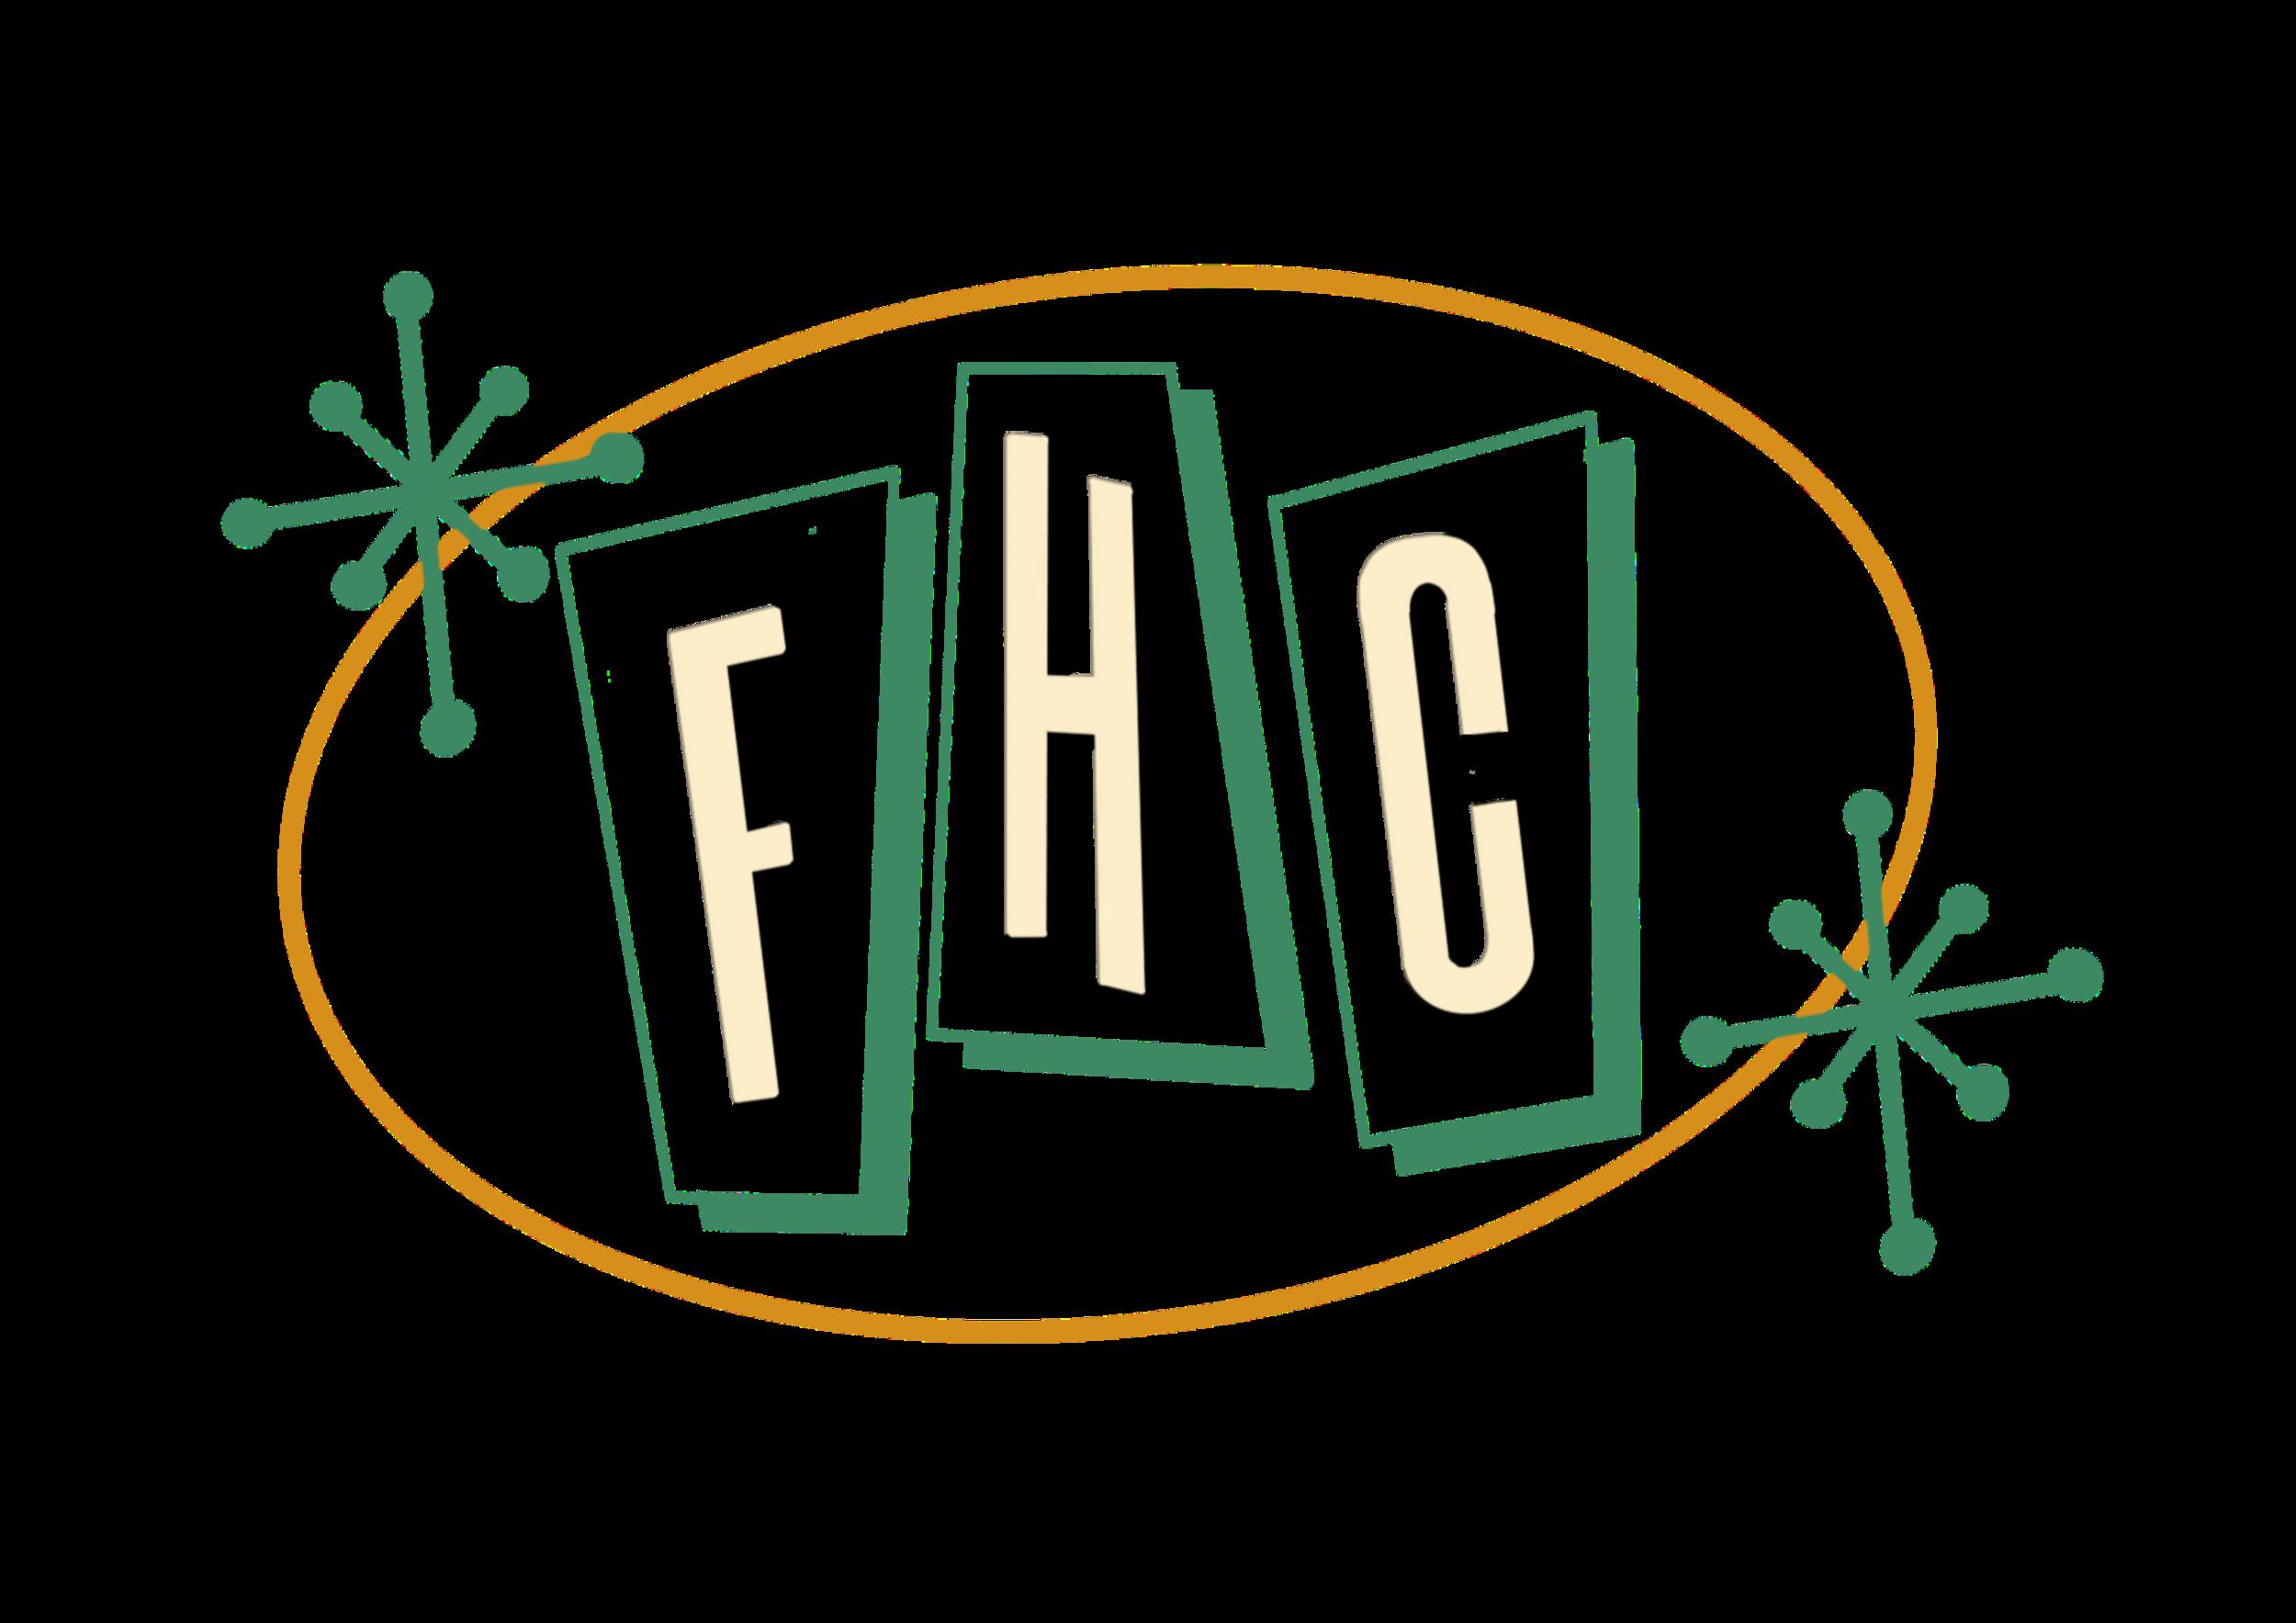 Fhc_Window.png